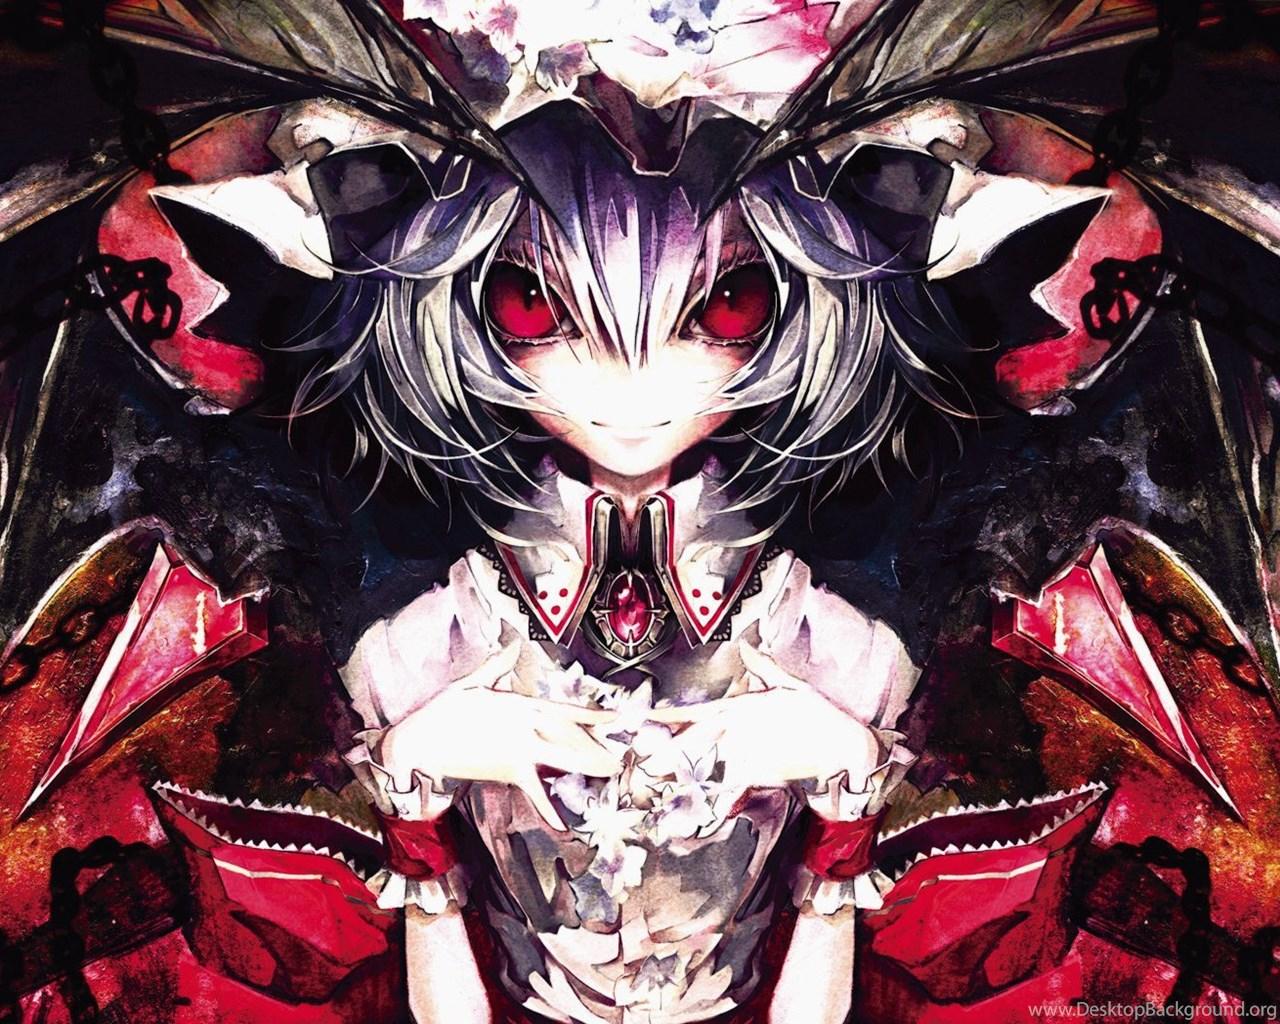 Wallpapers Vampire Girl And Boy Anime Hd Manga Fond Ecran Hentai Desktop Background